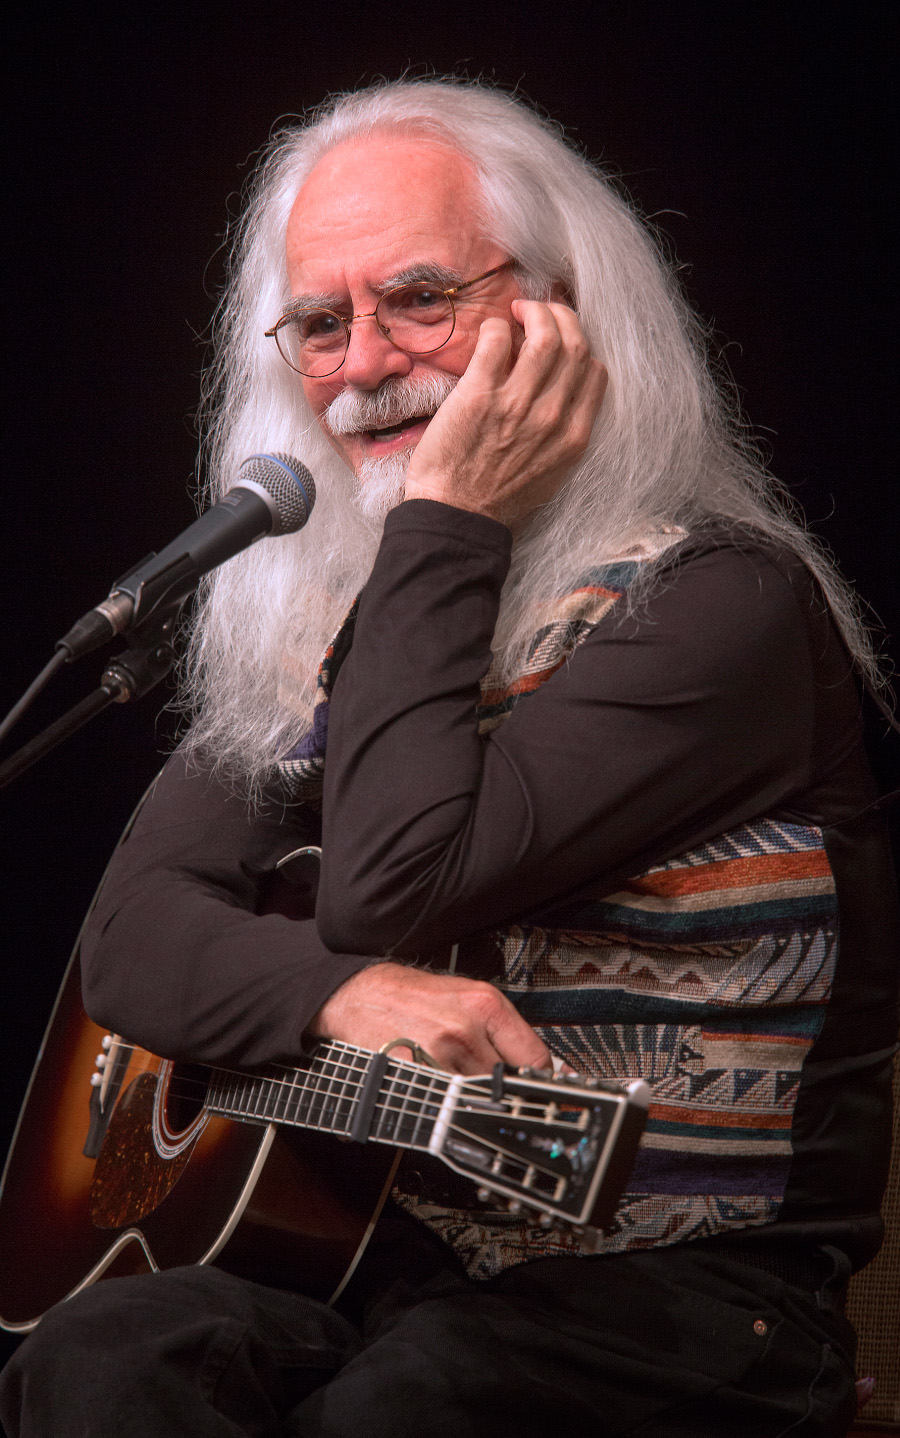 Storyteller And Songwriter Michael Reno Harrell